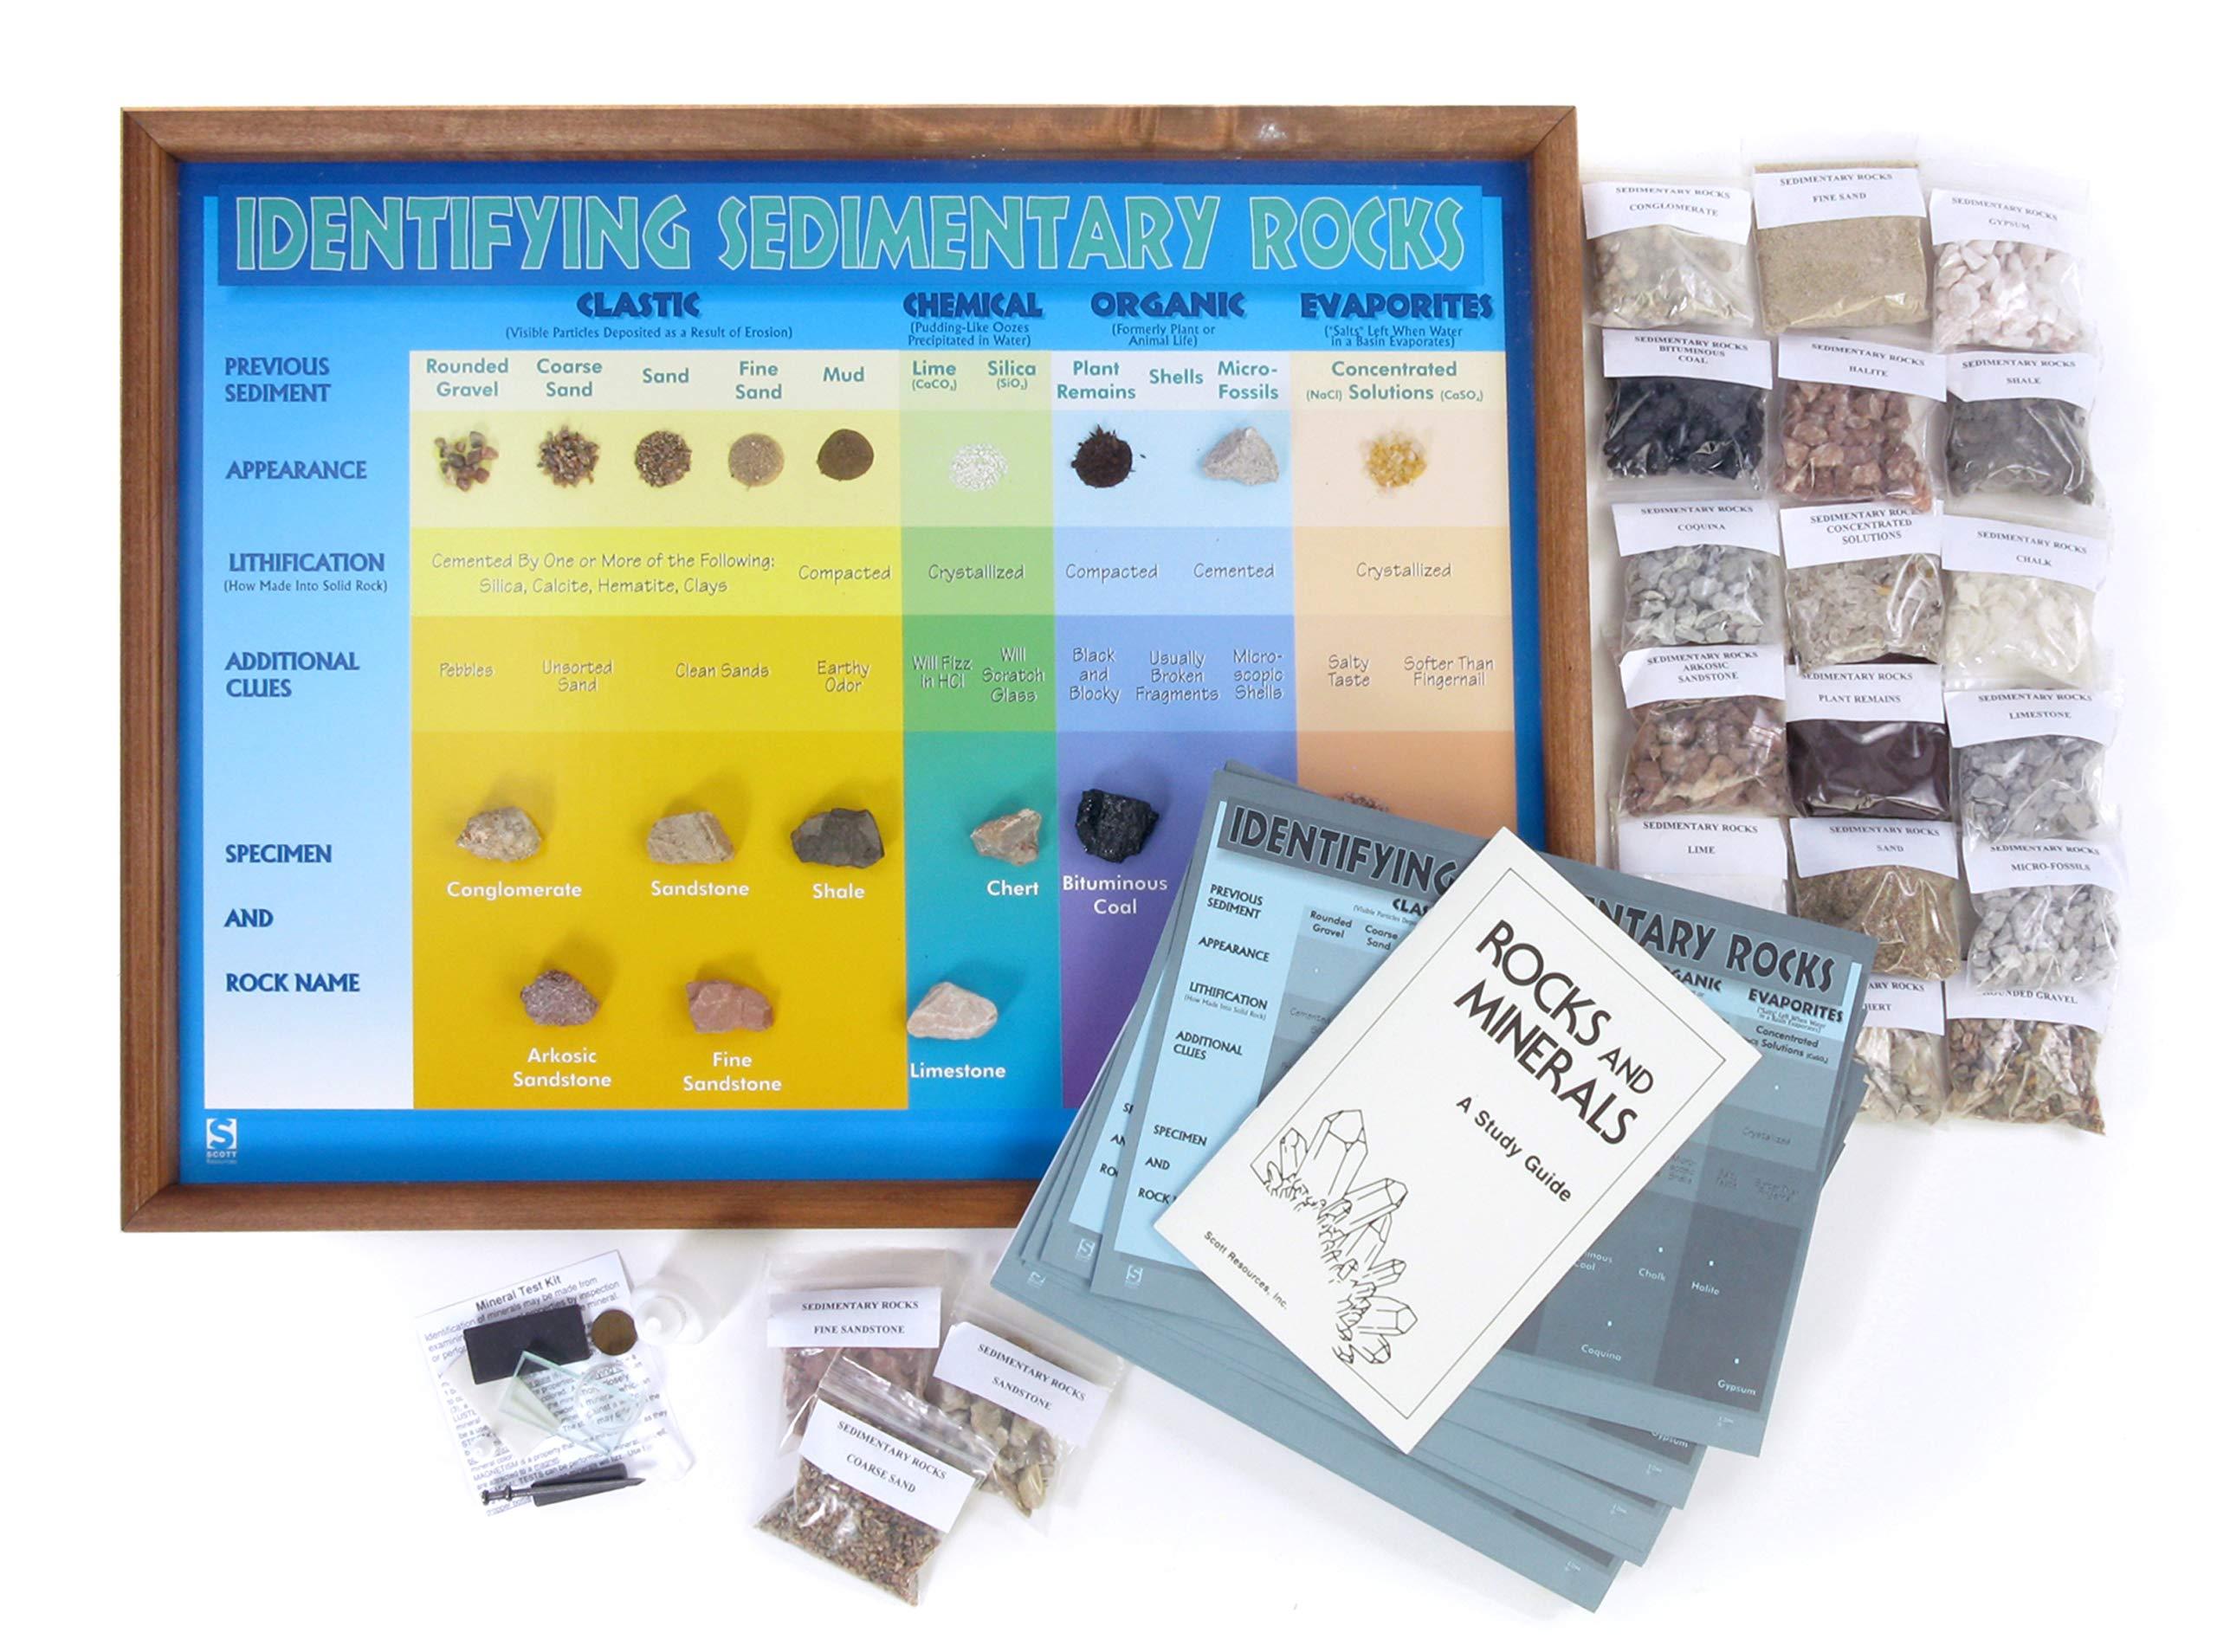 American Educational Identifying Sedimentary Rocks Classroom Project